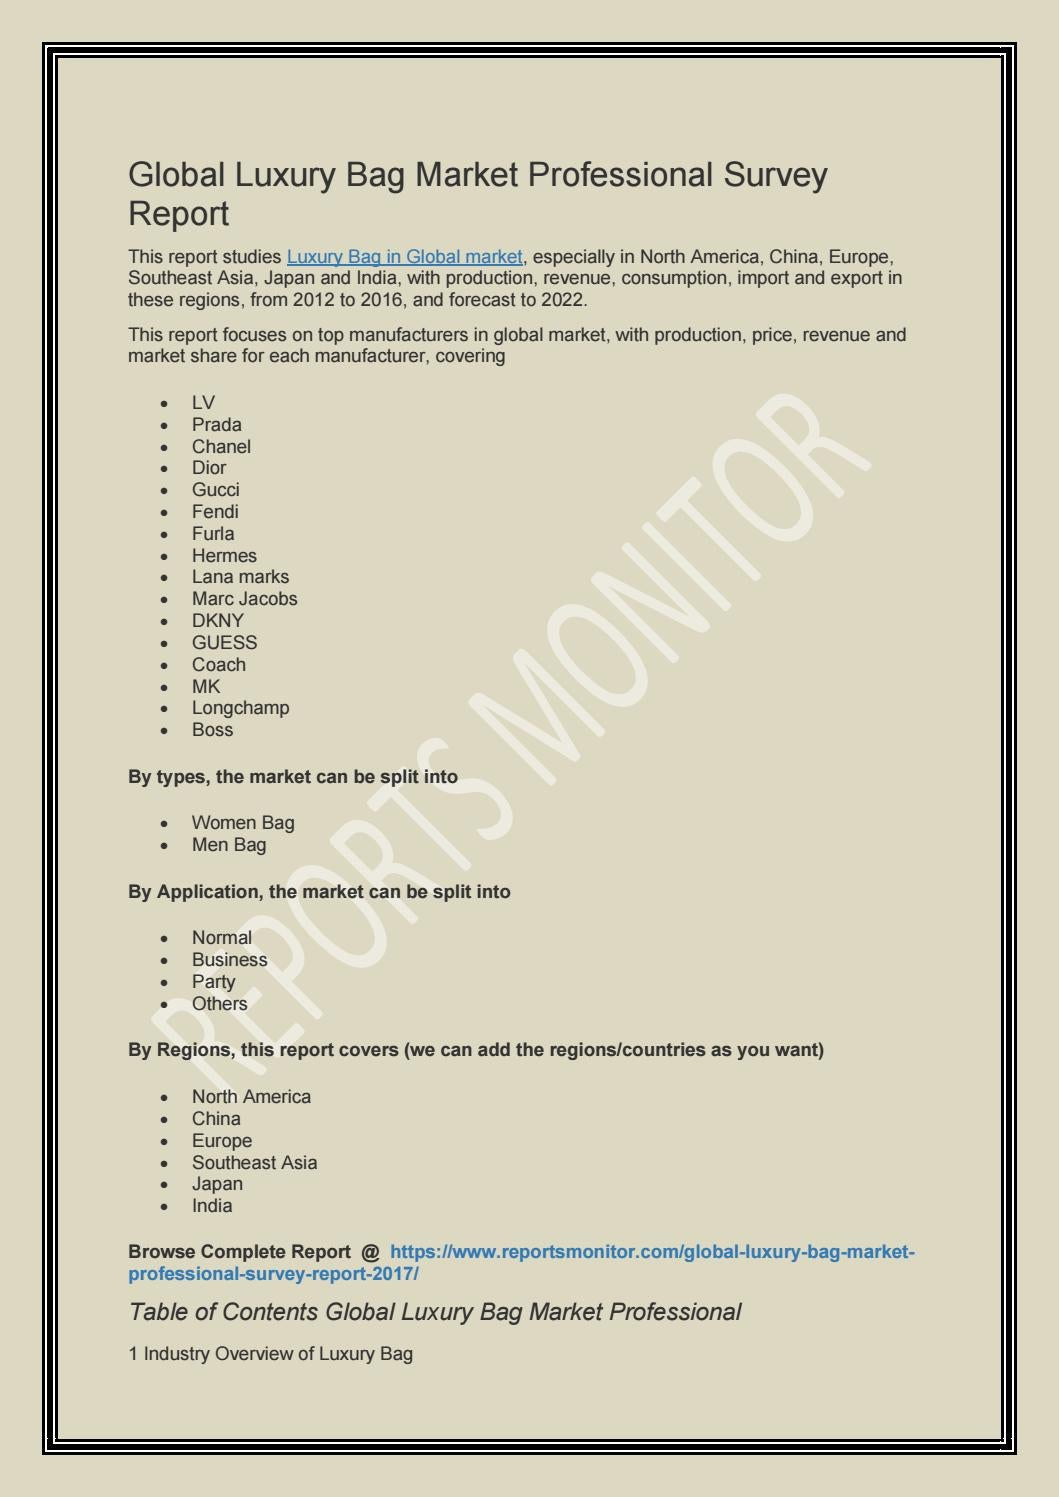 global luxury bag market professional survey report by adneyaiken